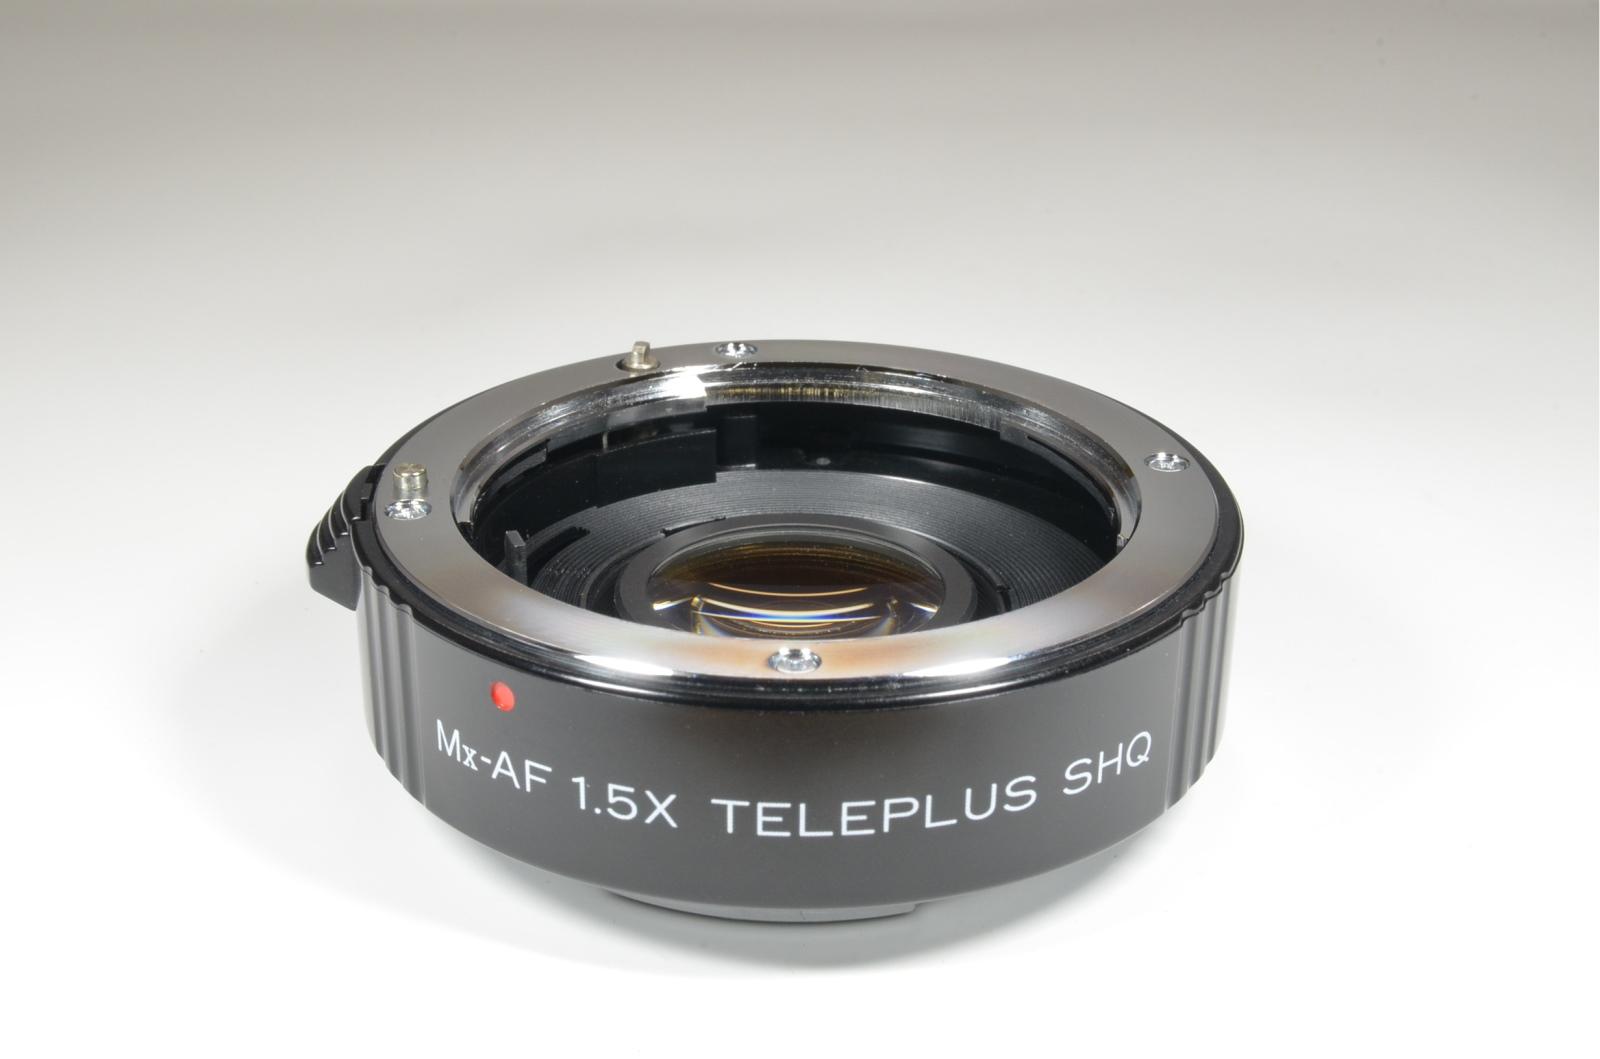 minolta high speed af apo 80-200mm f2.8 g lens sony with teleplus 1.5x